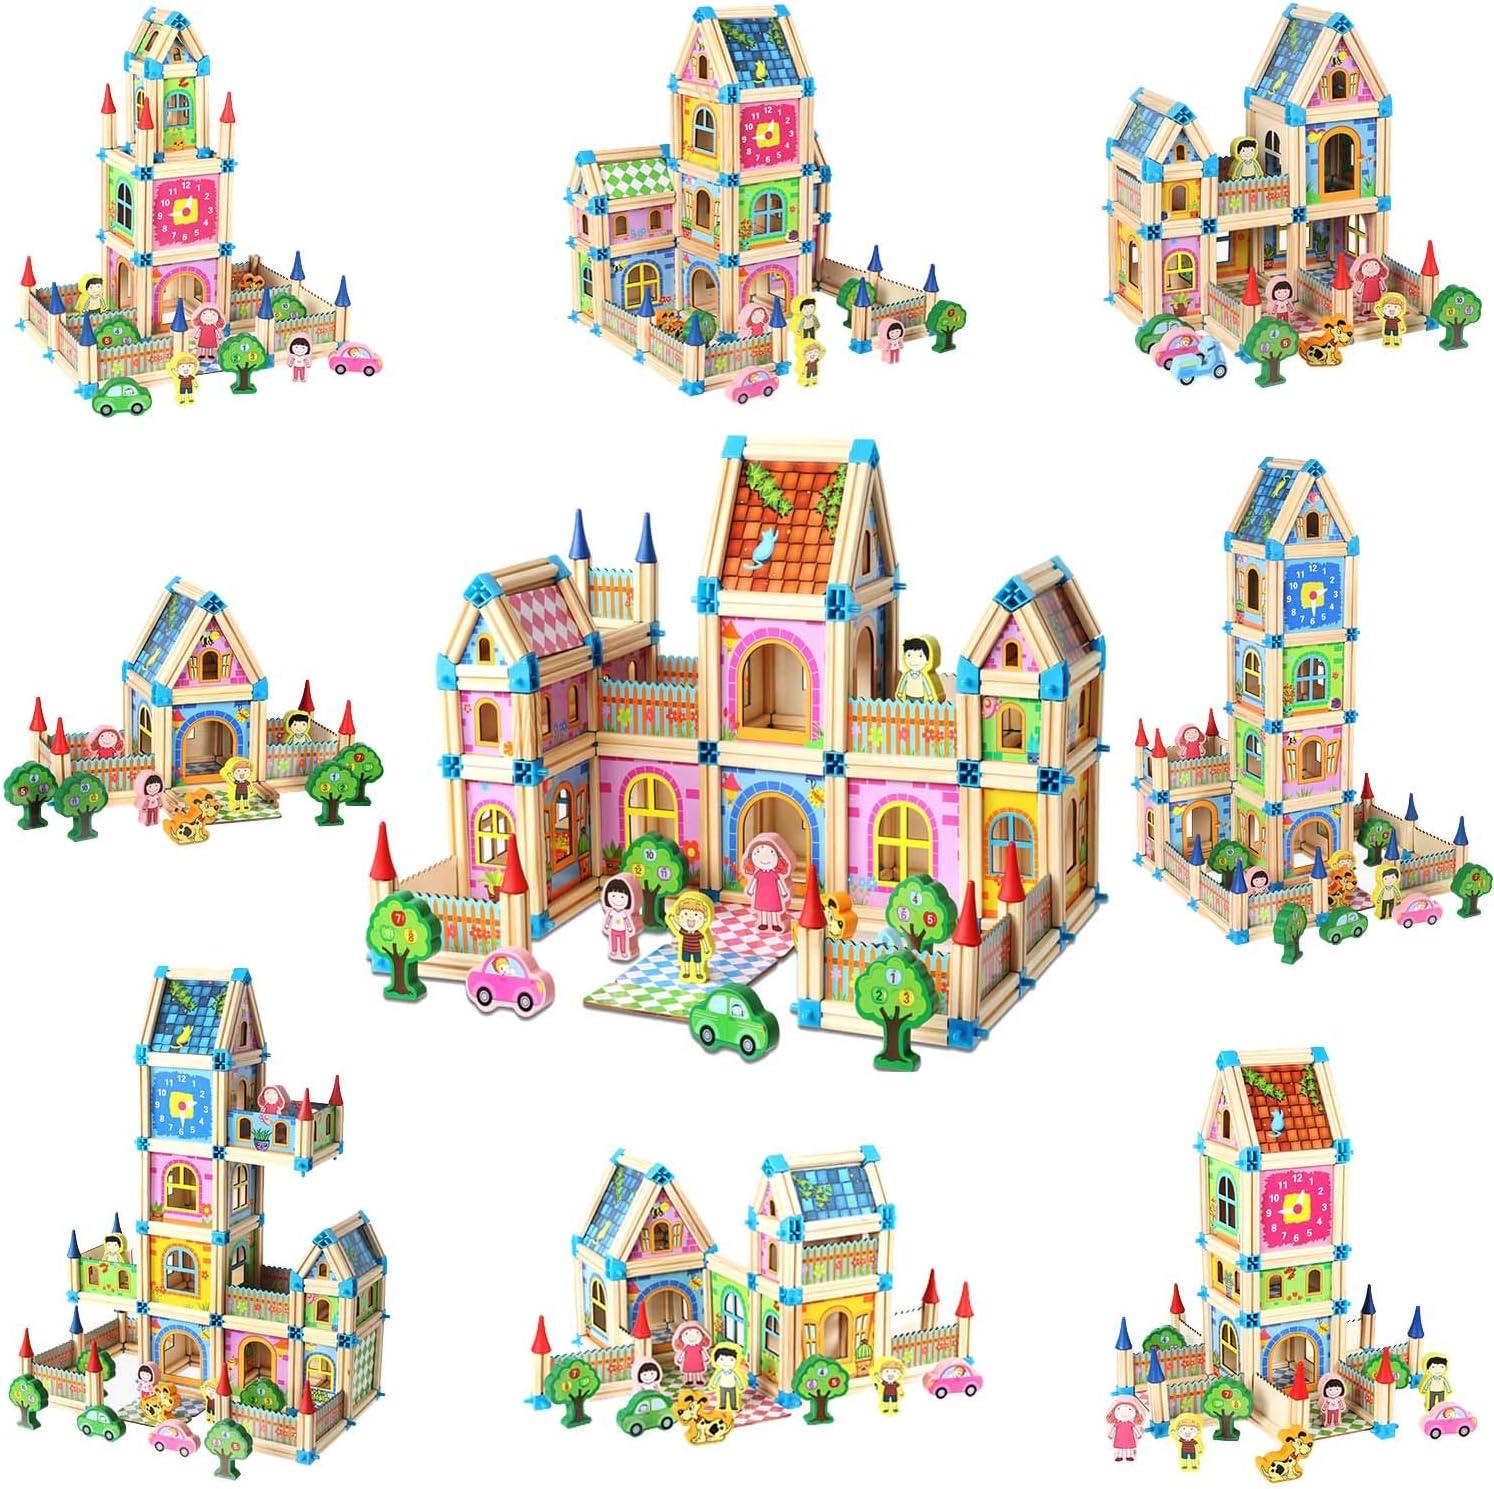 Details about  /Colorful Wooden Building Blocks Castle Set Construct Kids Children Toys Gift CO